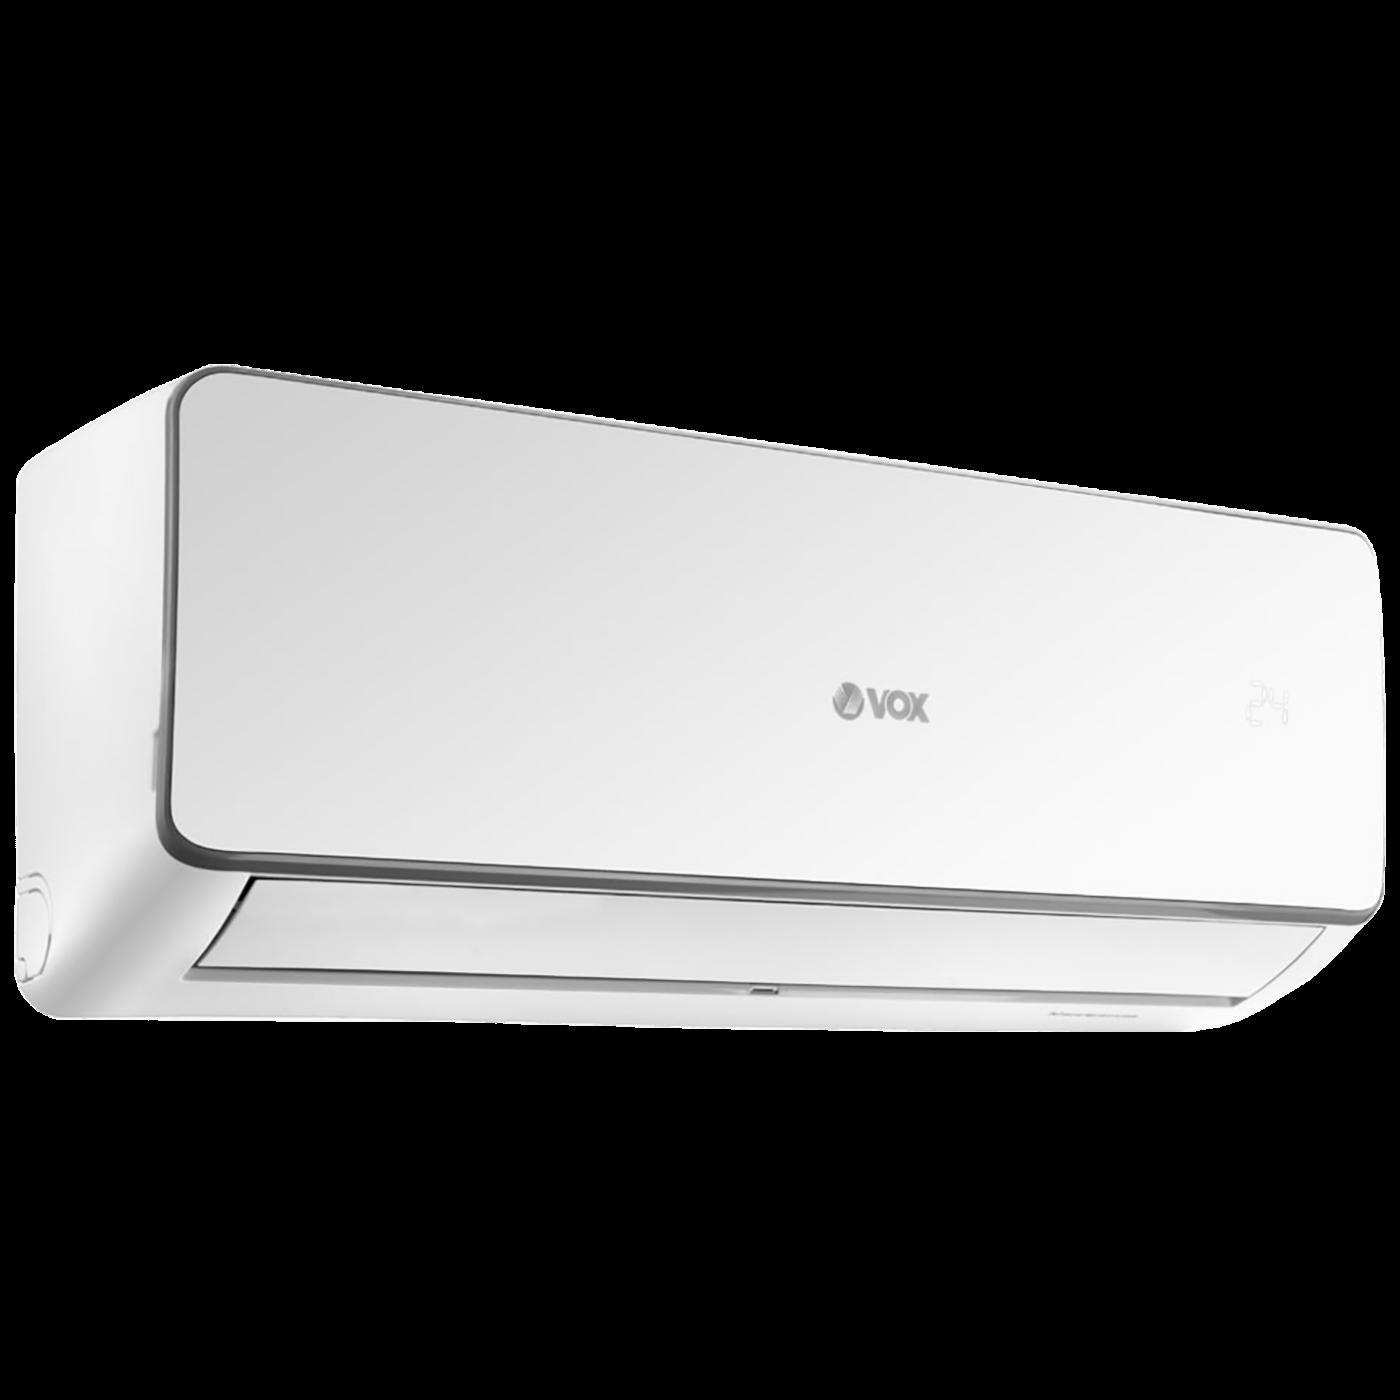 Klima uređaj, split sistem, 12000 bTu, Inverter, A++/A+